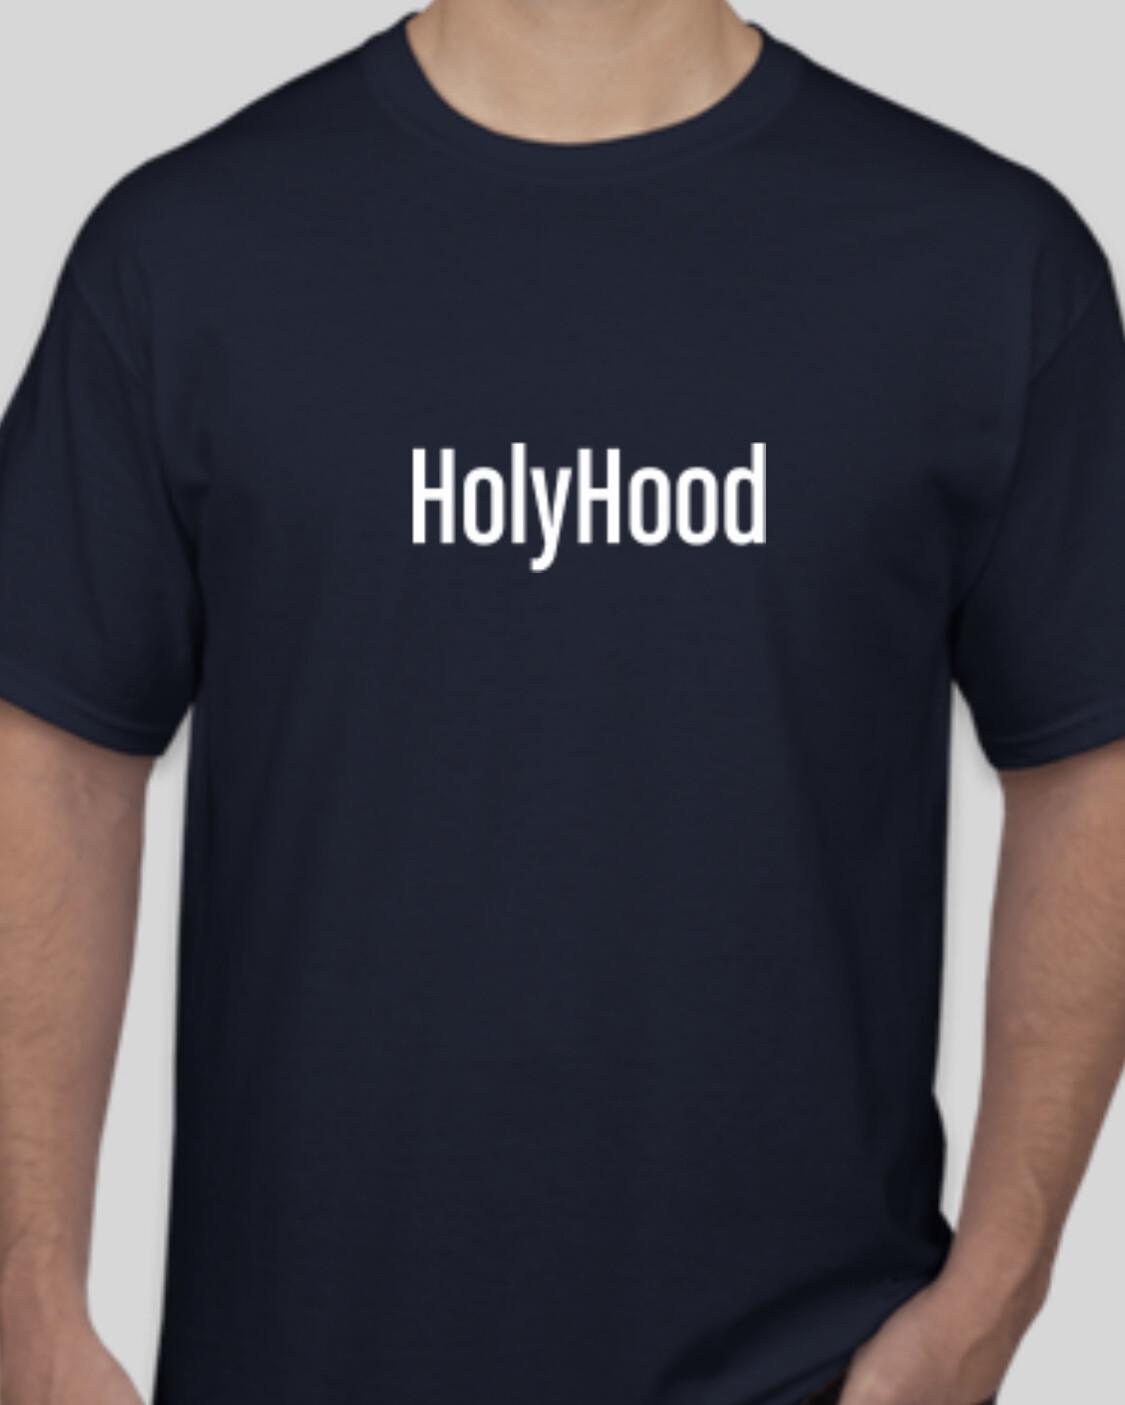 HolyHood T-shirt